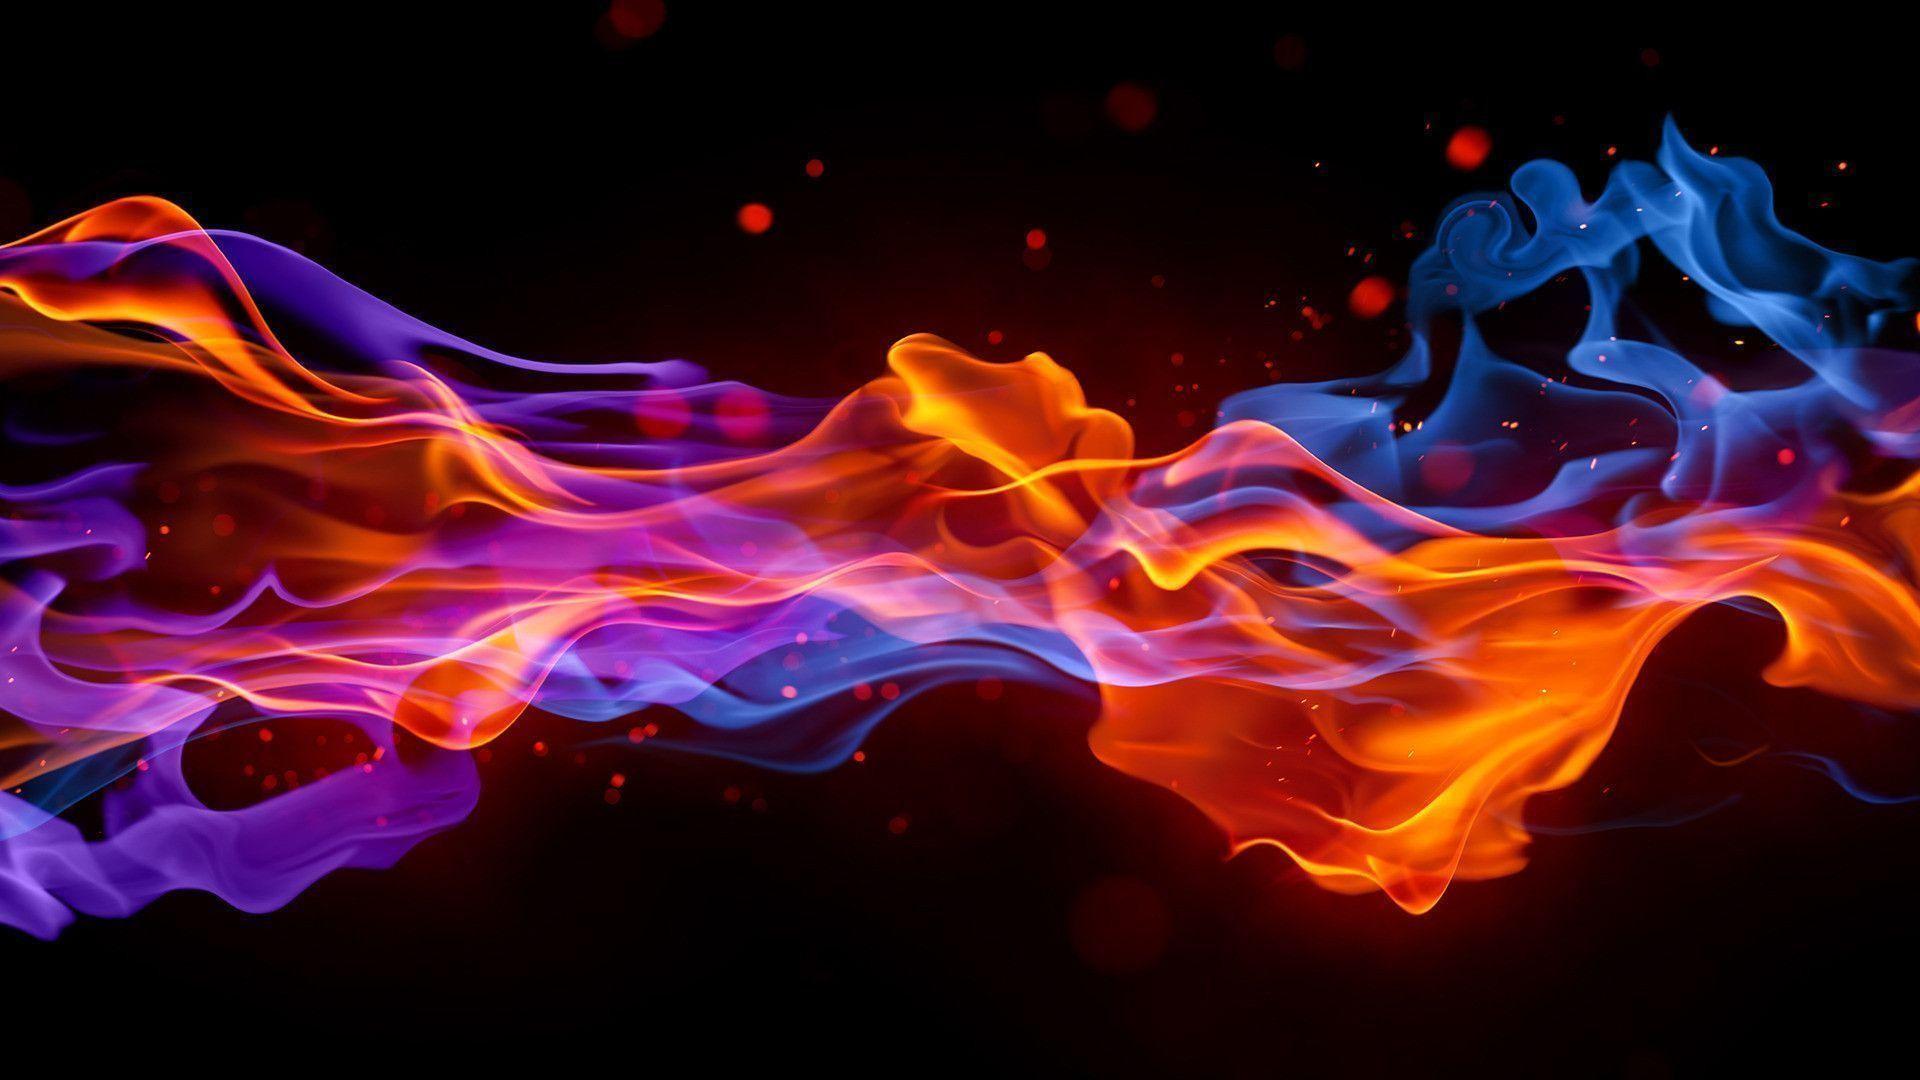 Res: 1920x1080, Blue Fire Wallpapers - HD Wallpapers Inn